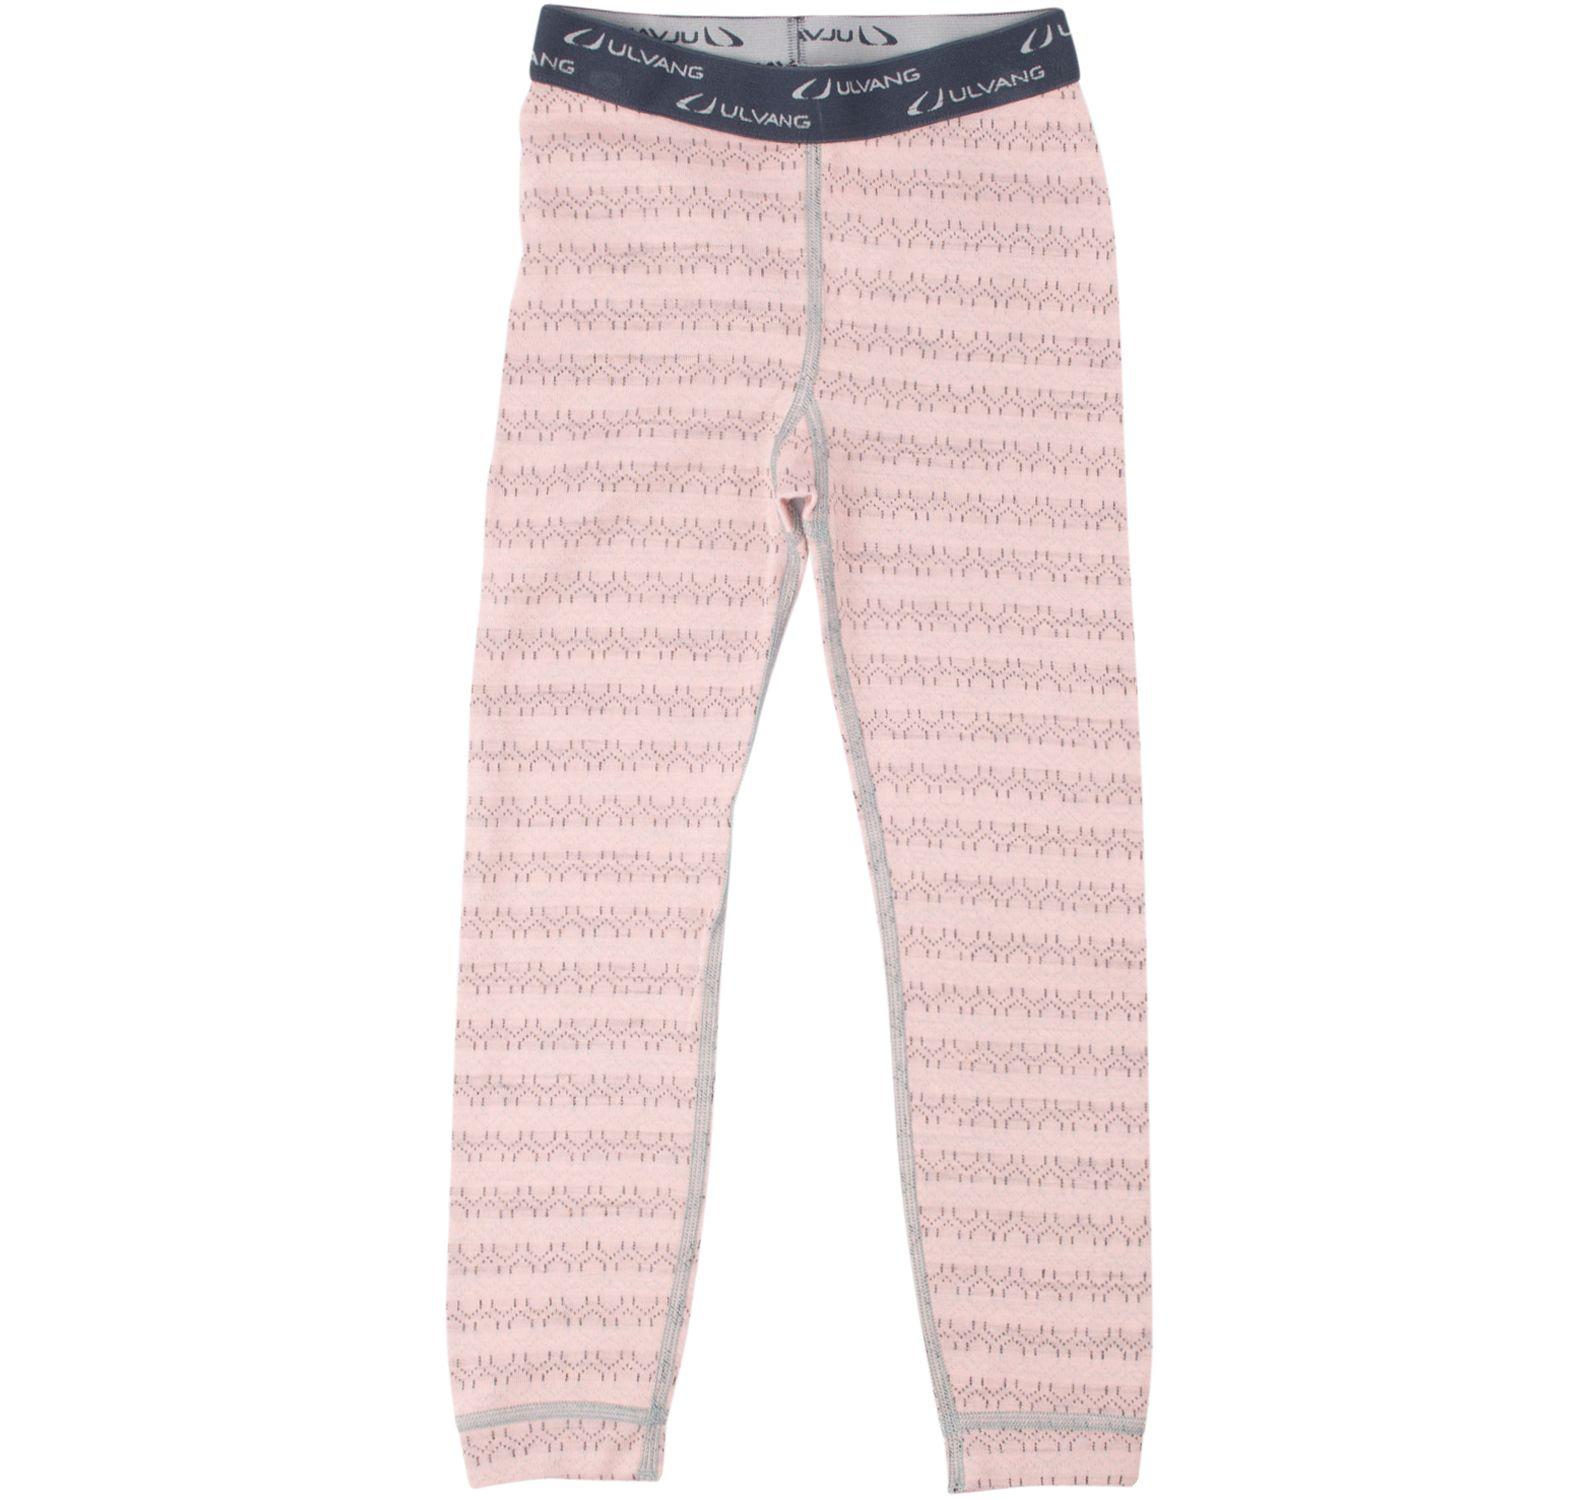 50fifty 3.0 pants kids, sweet pink mix, 4,  ulvang underställ